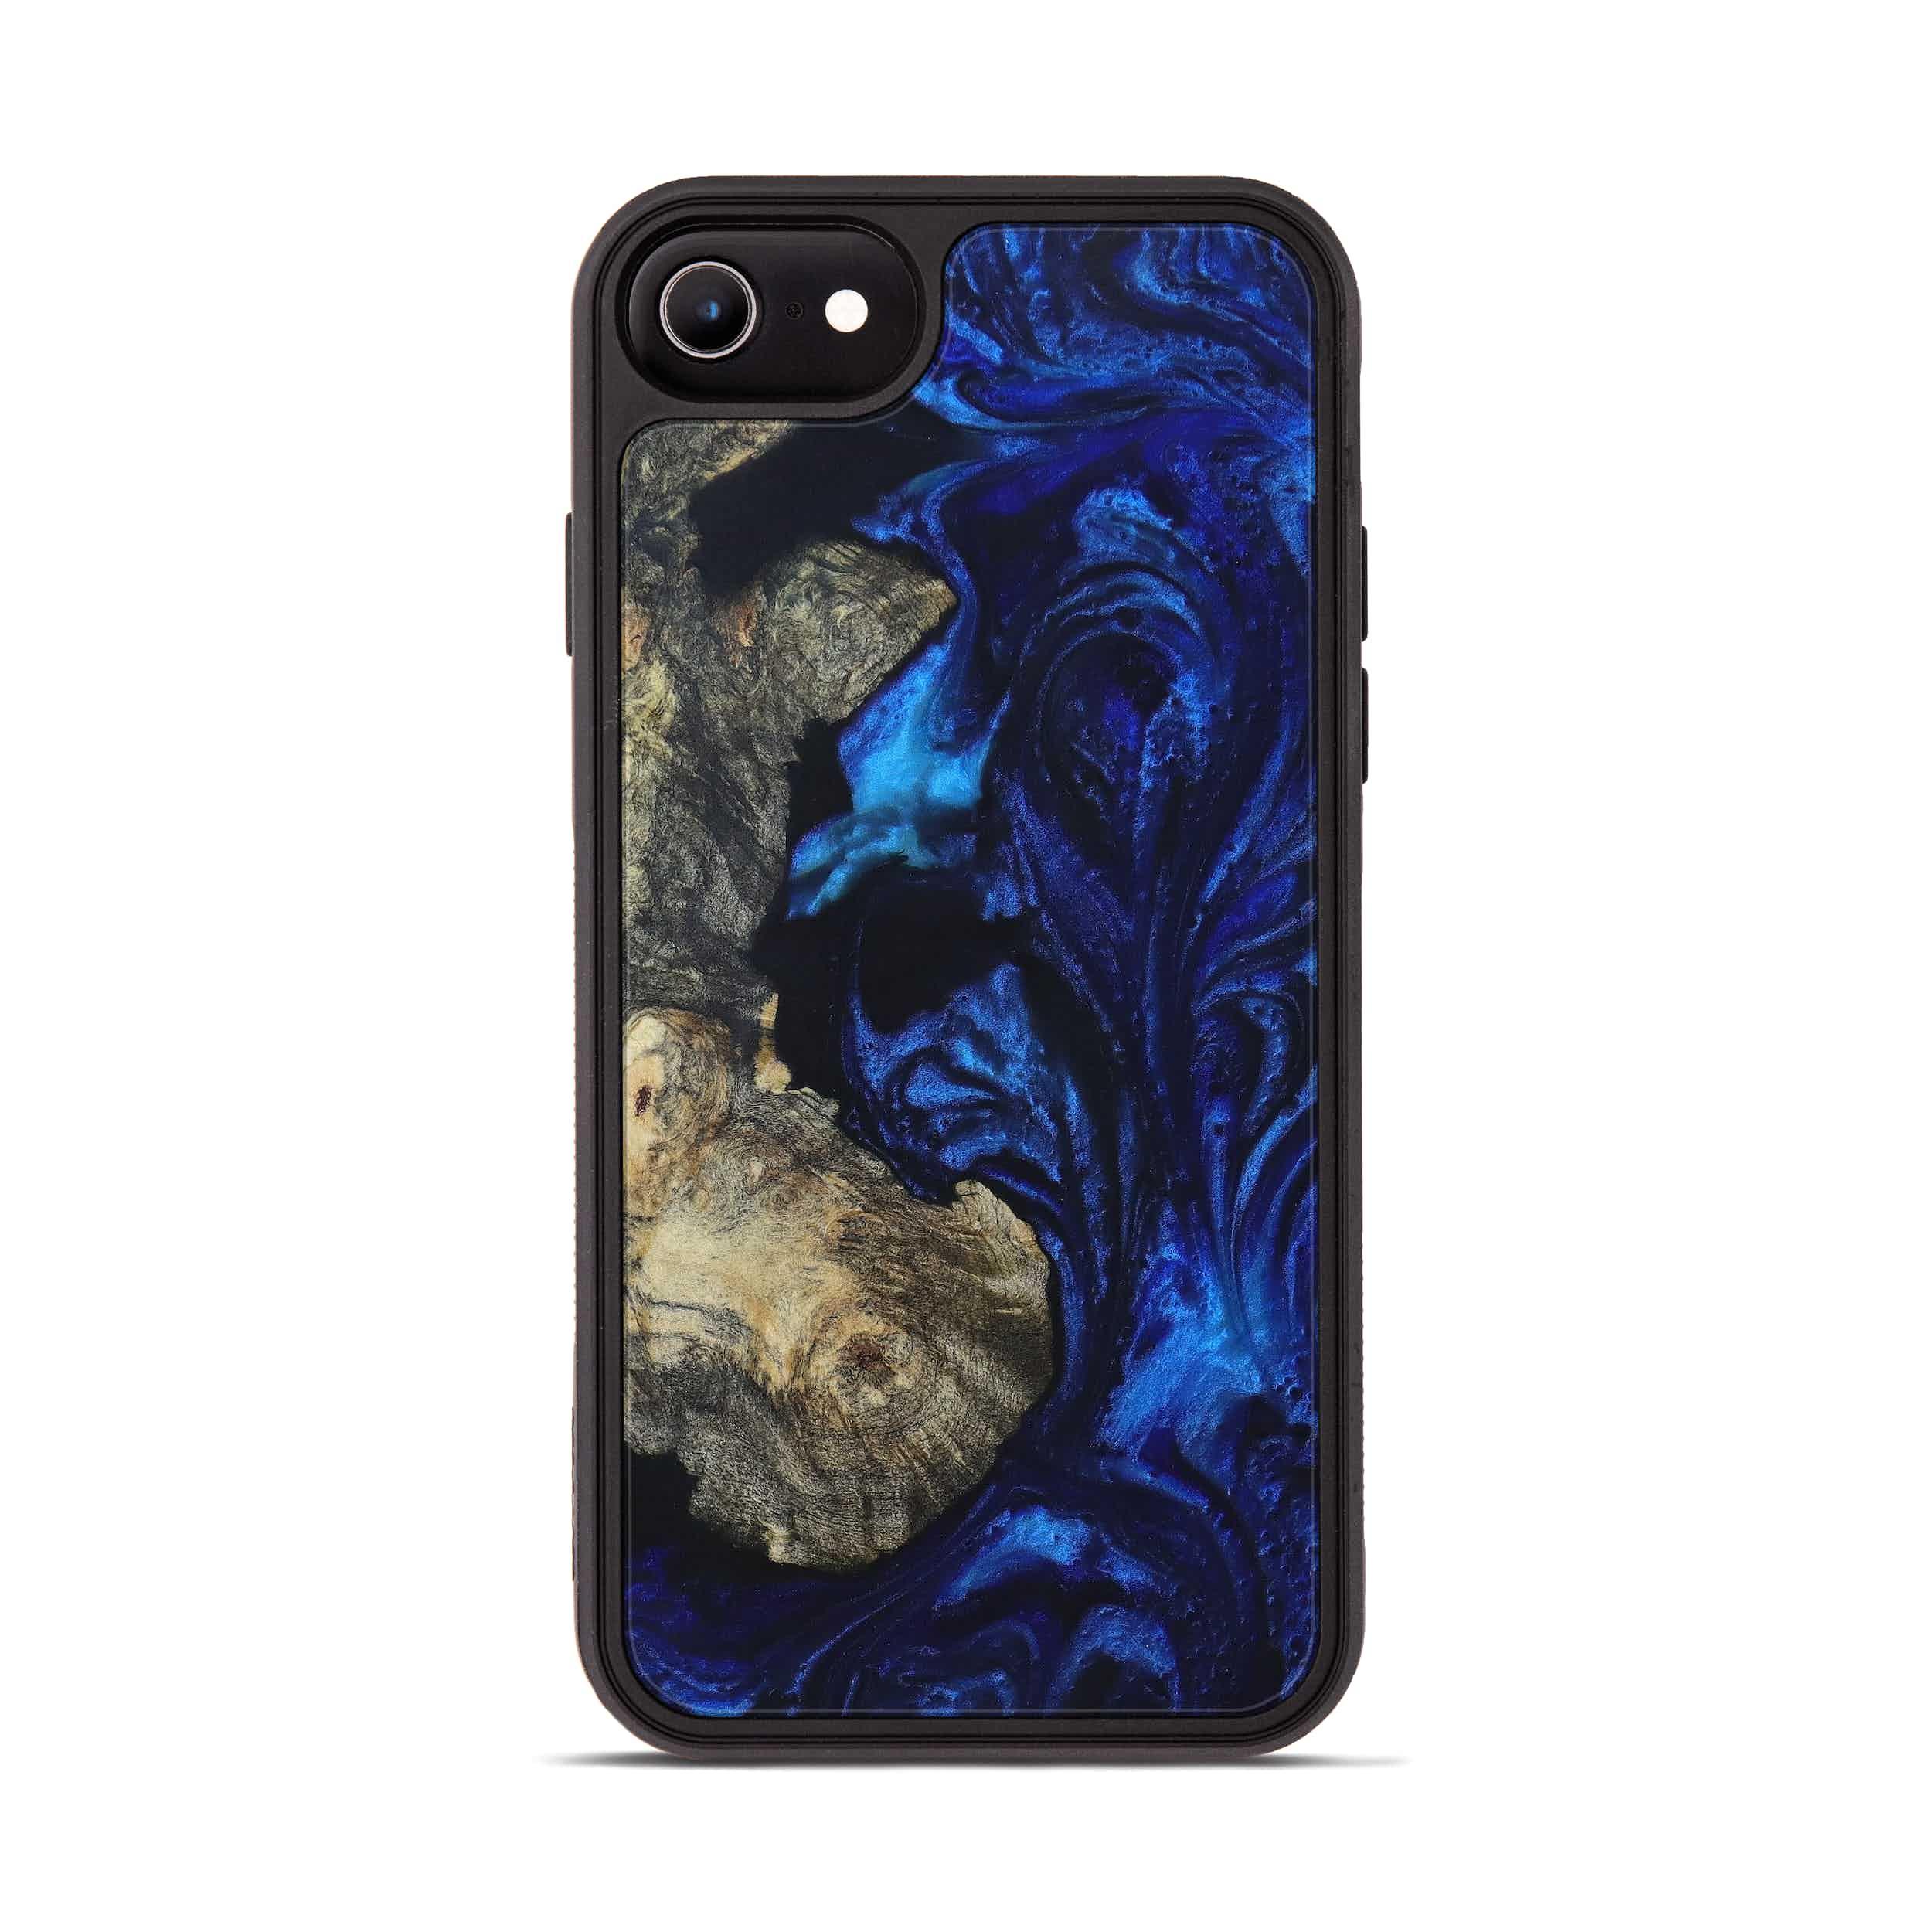 iPhone 7 Wood+Resin Phone Case - Karolina (Dark Blue, 399847)